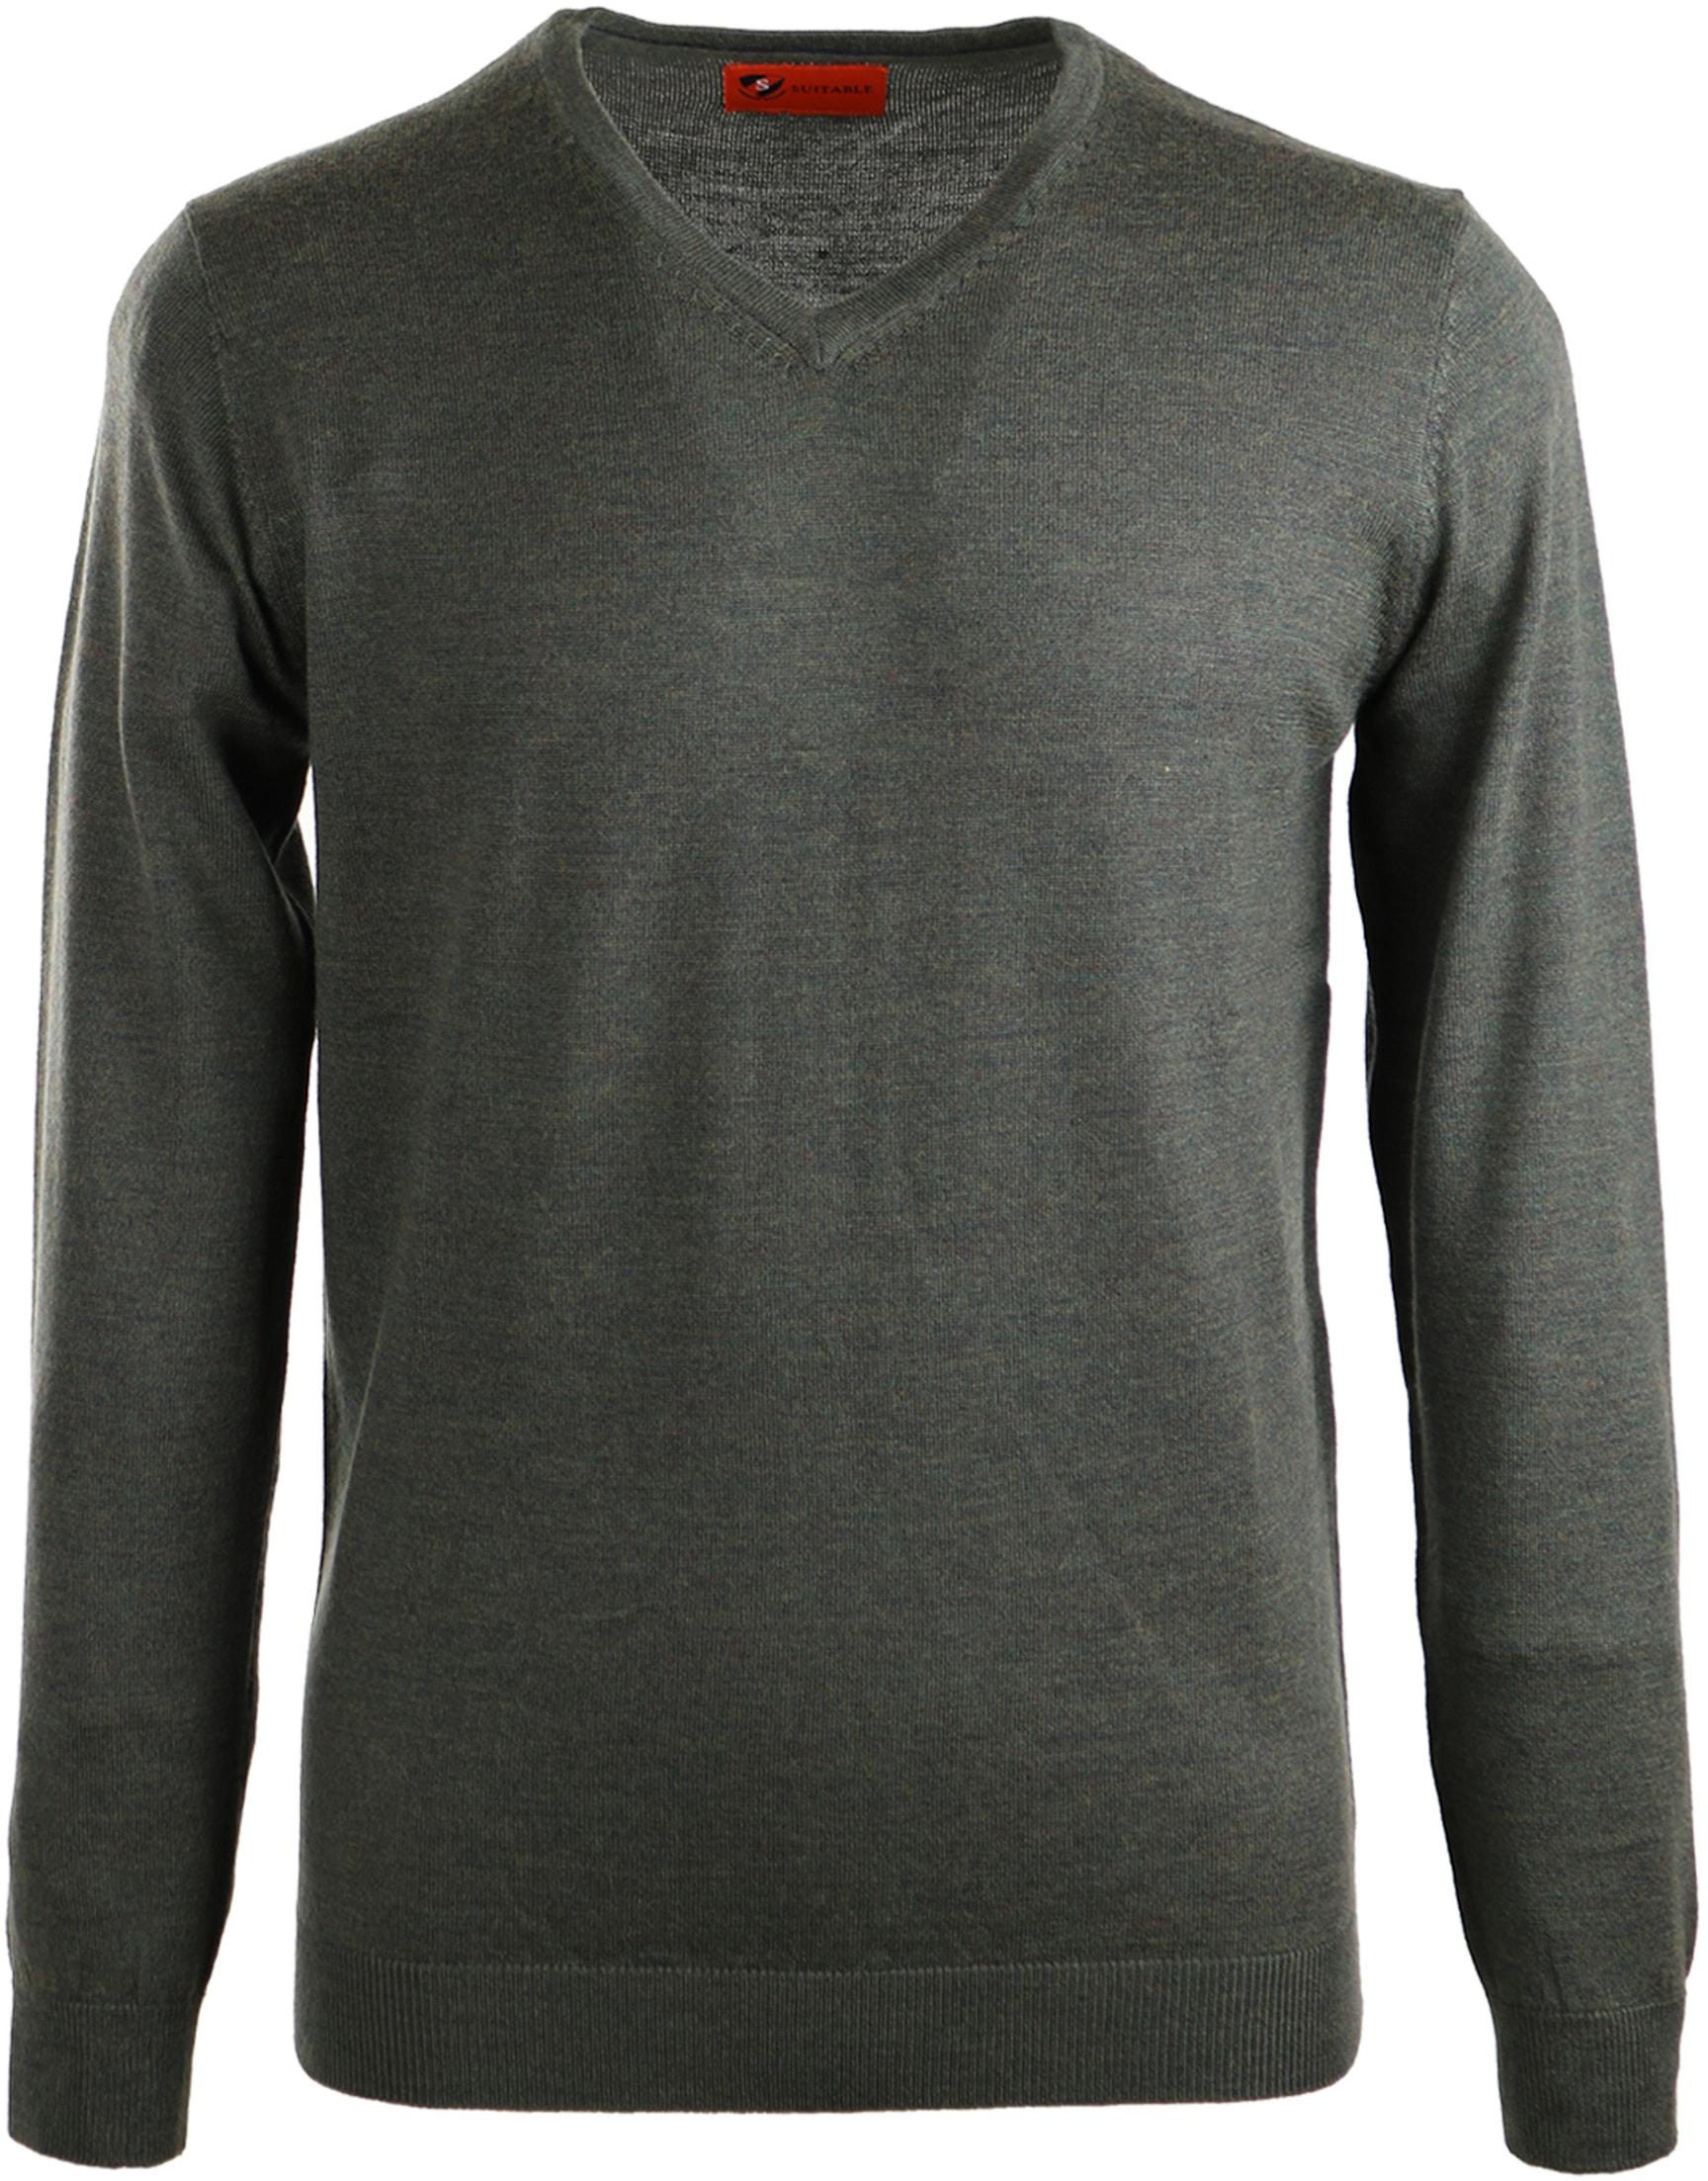 Suitable Pullover Merino Wool Dark Green foto 0